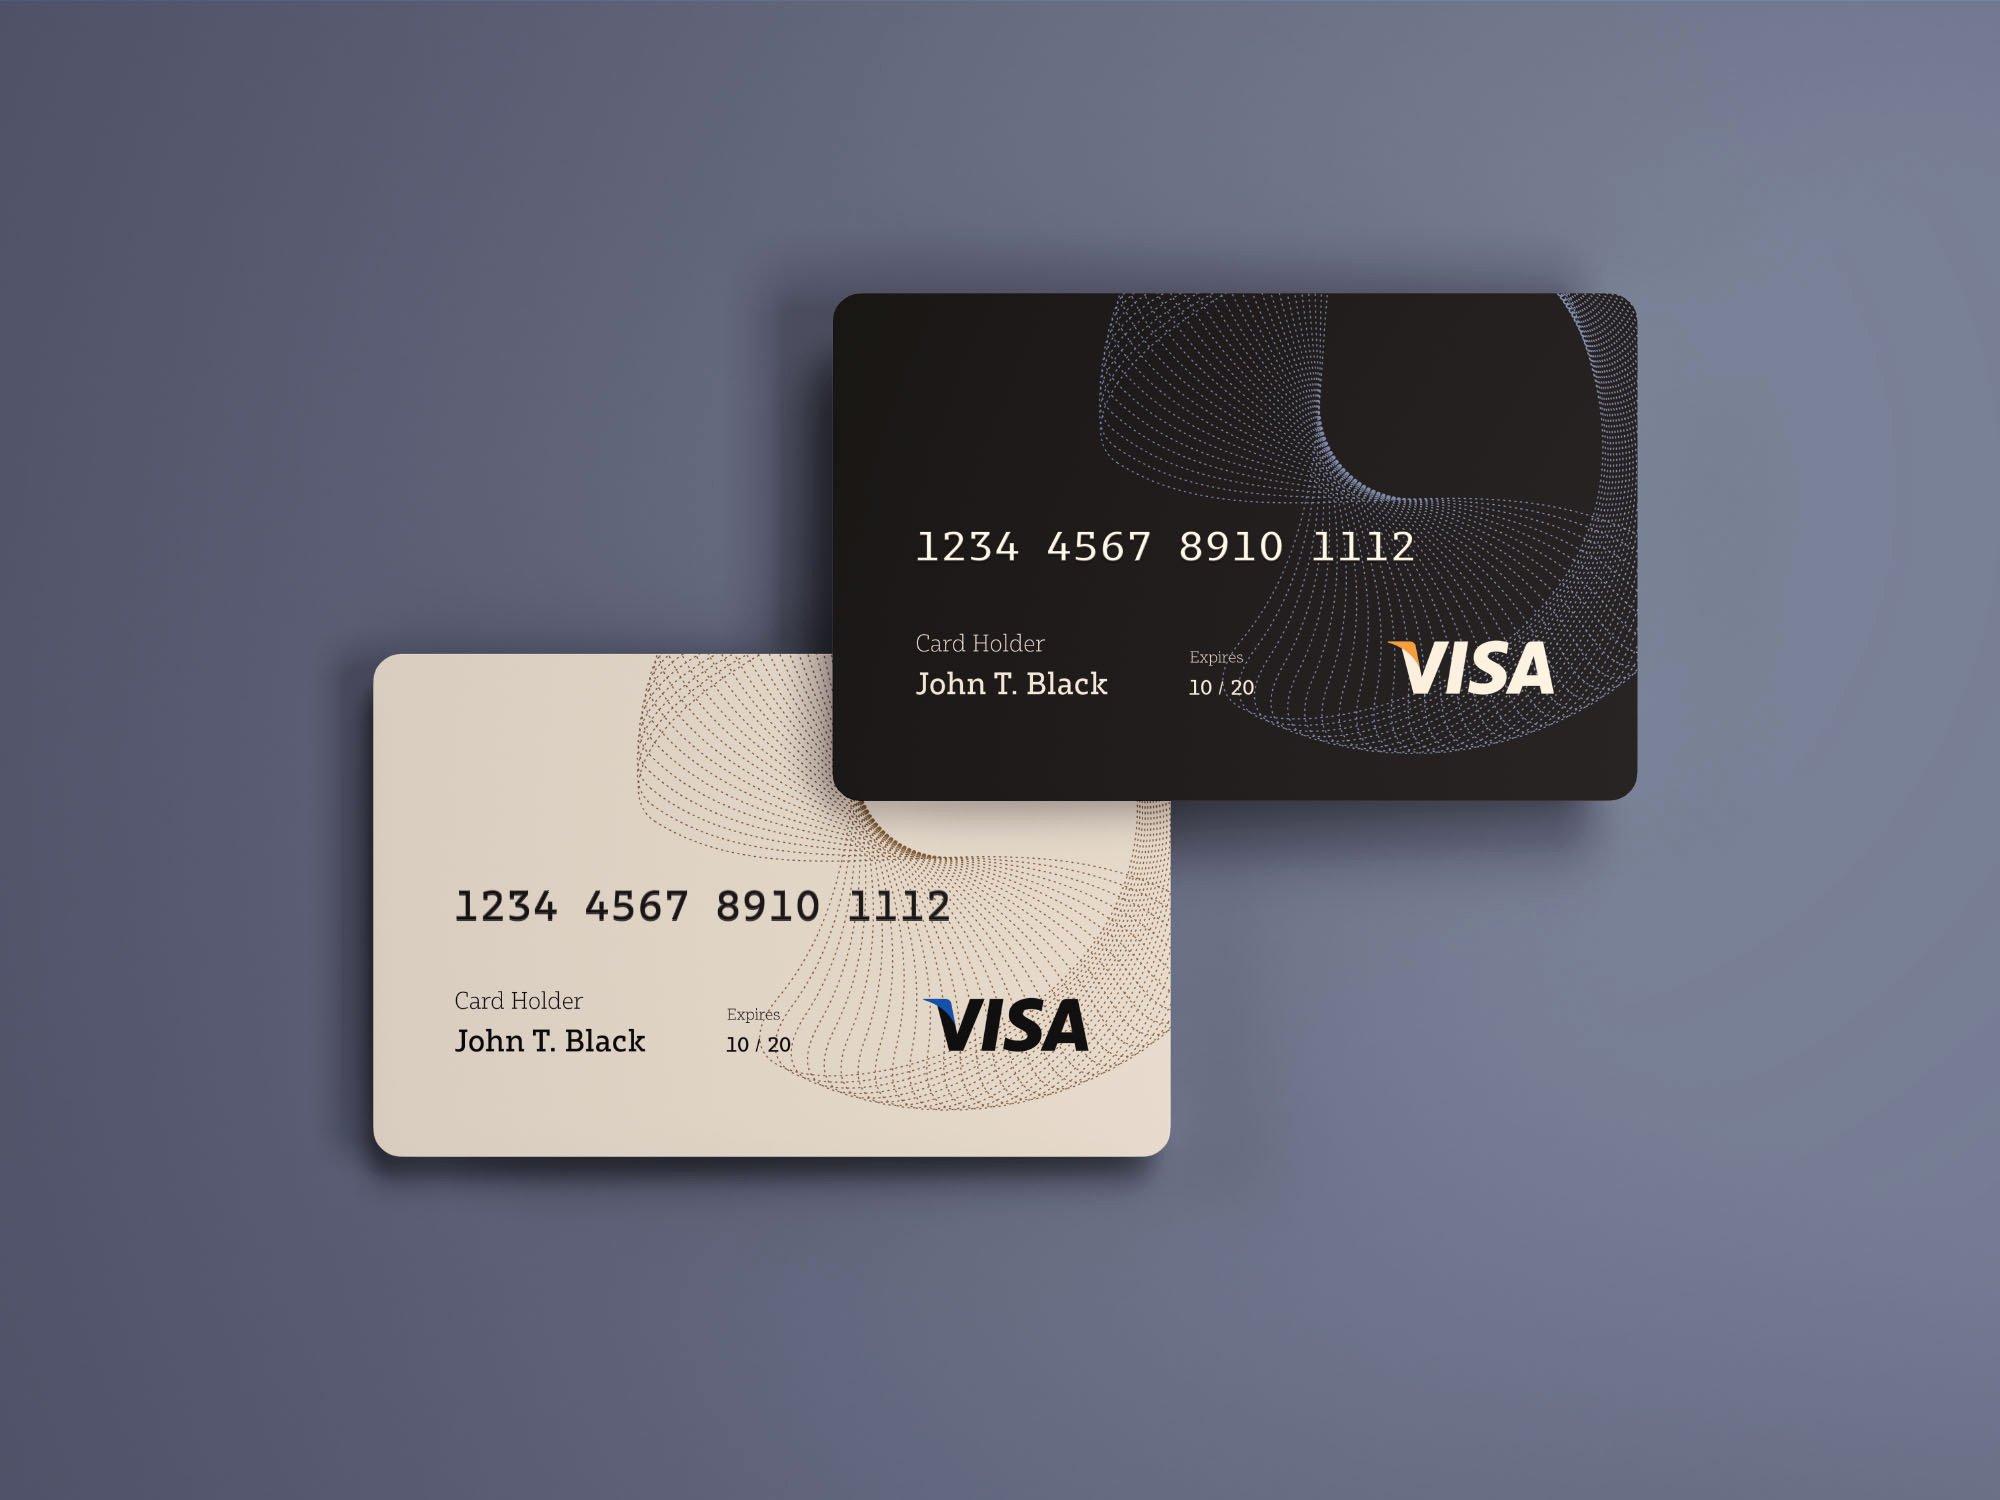 Credit Card Mockup Psd Luxury Credit Cards Mockup Psd